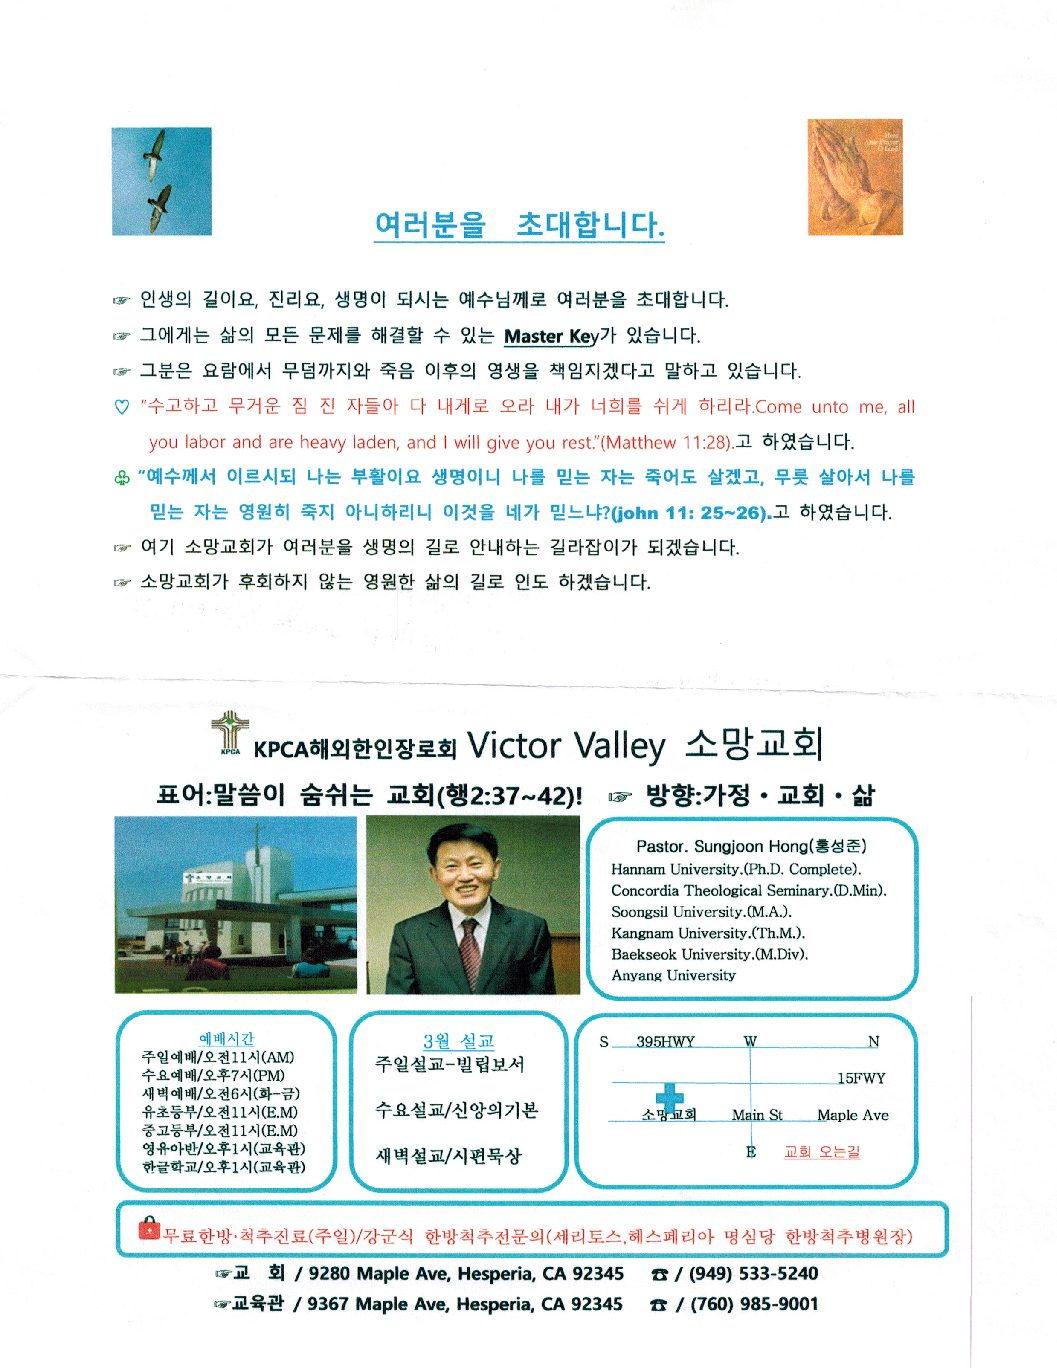 VVHC 전도지